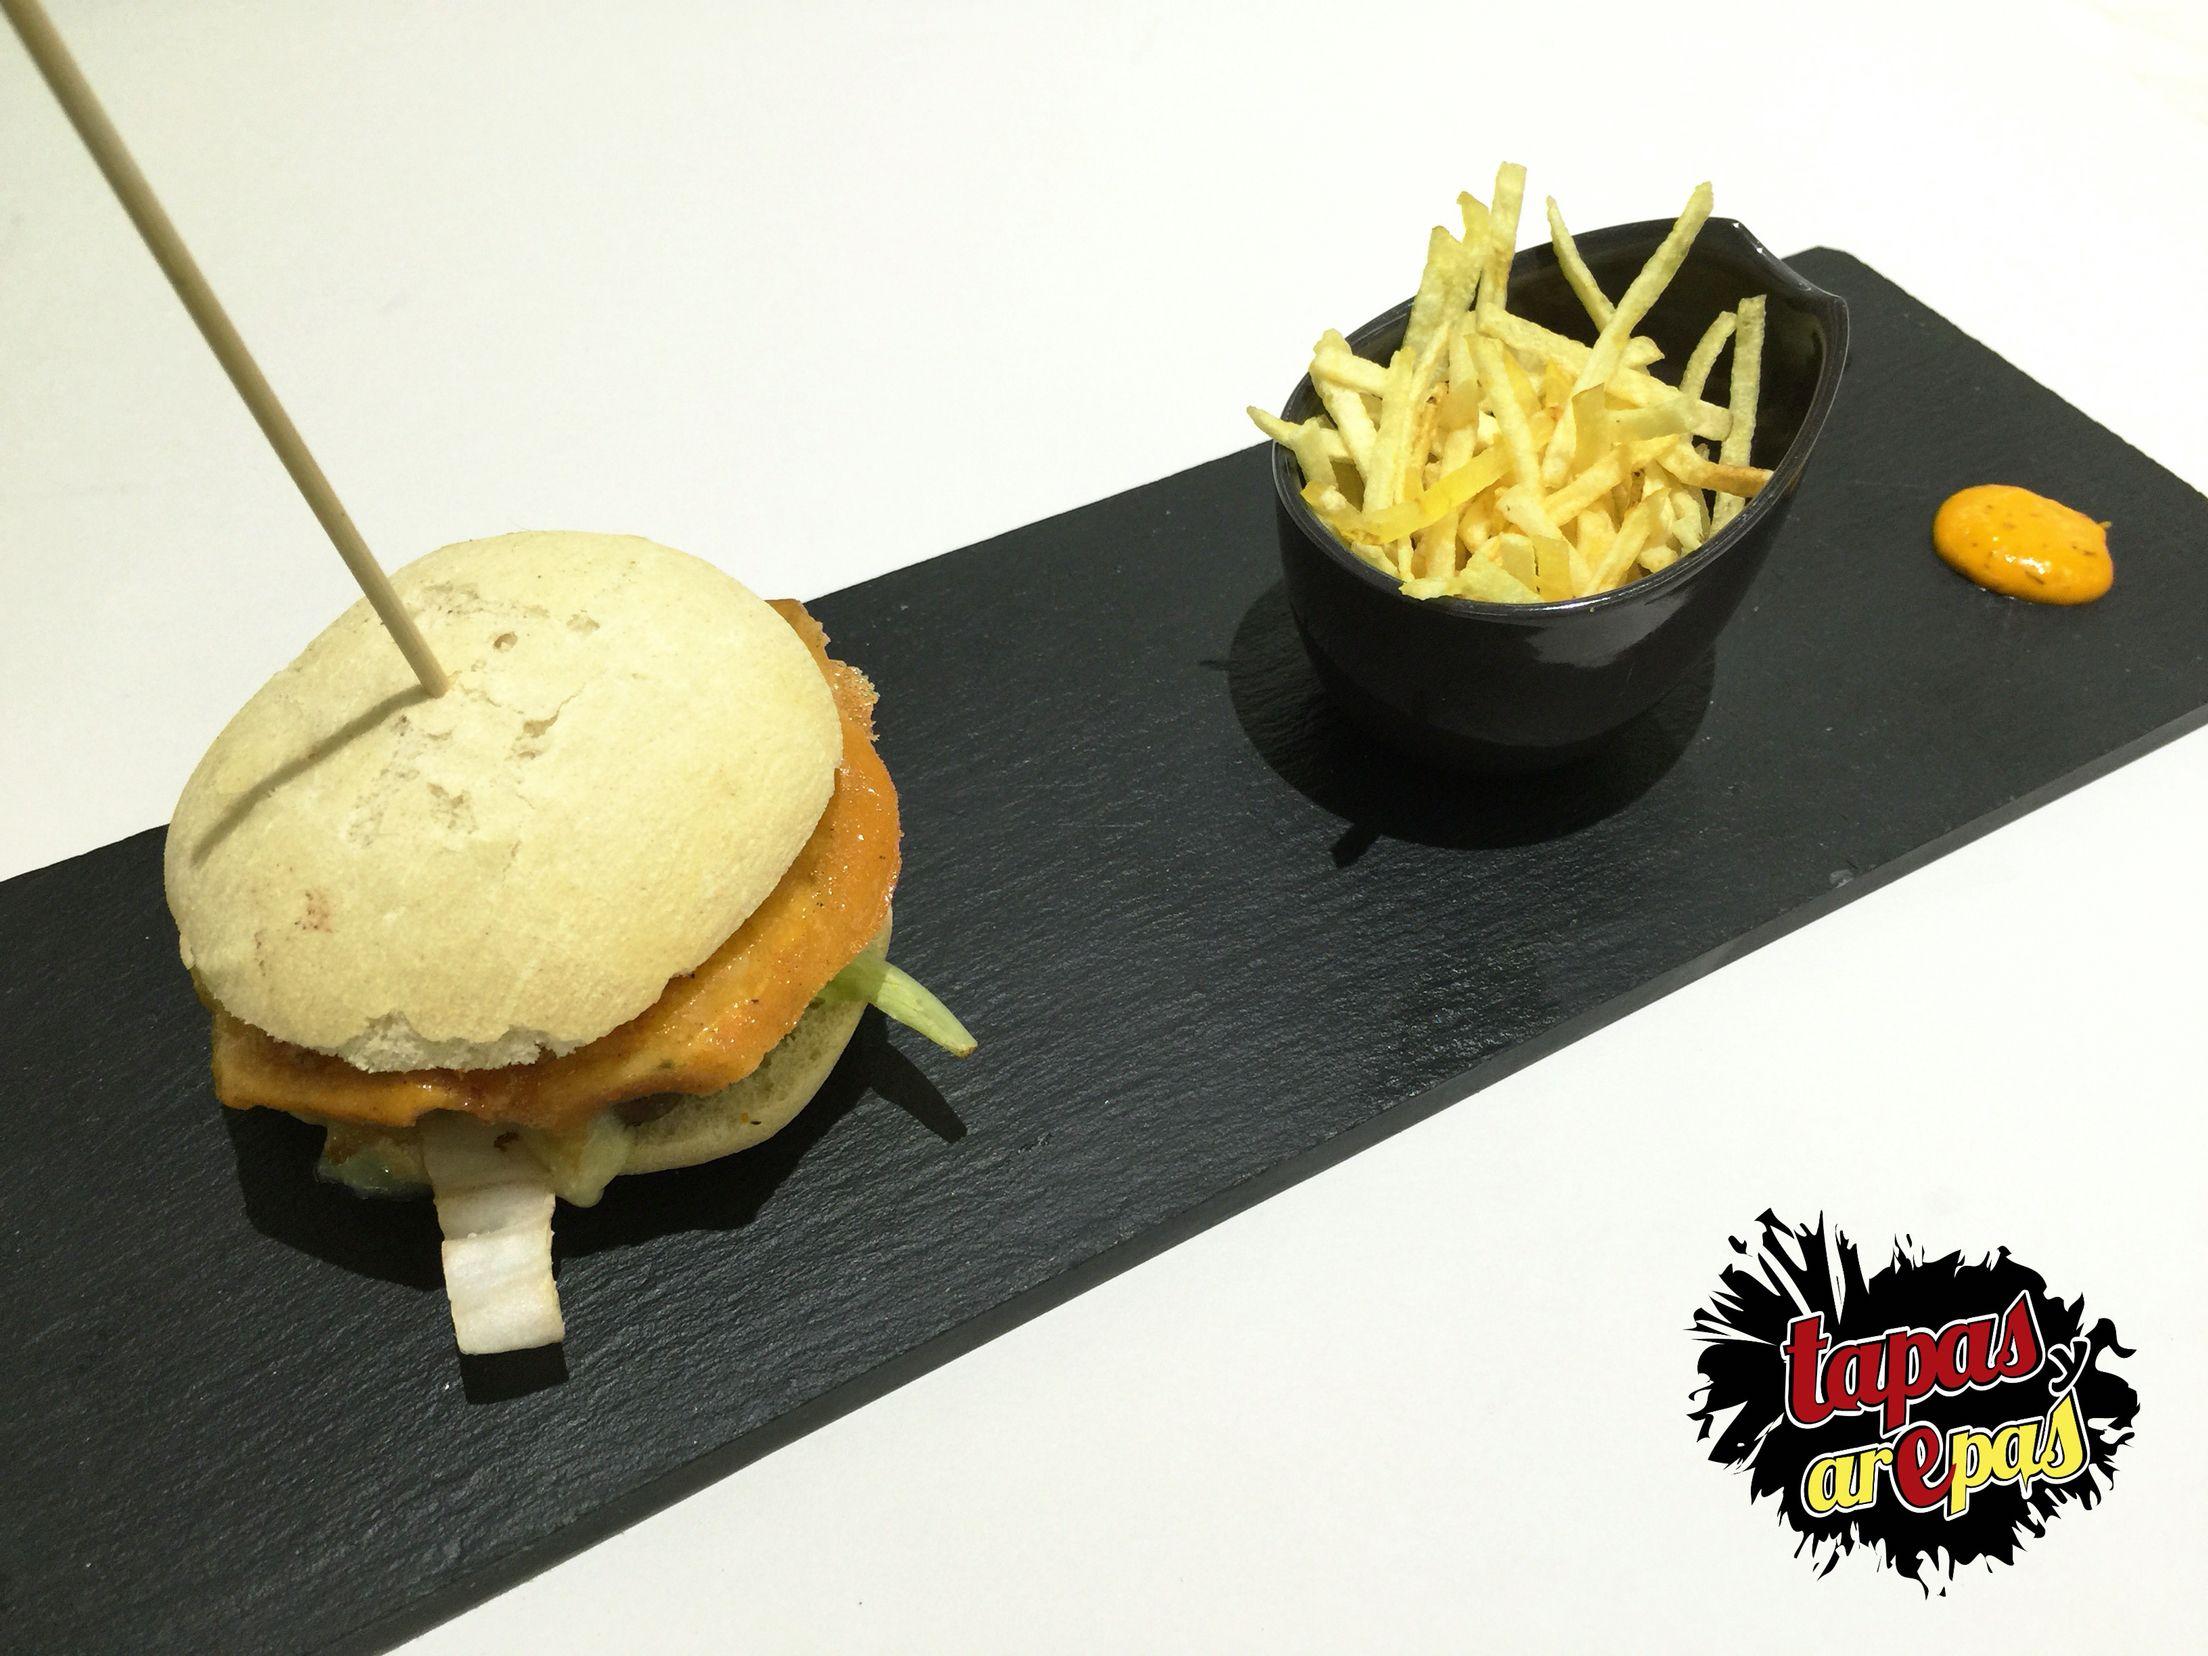 Nuestra hamburguesa Paisa